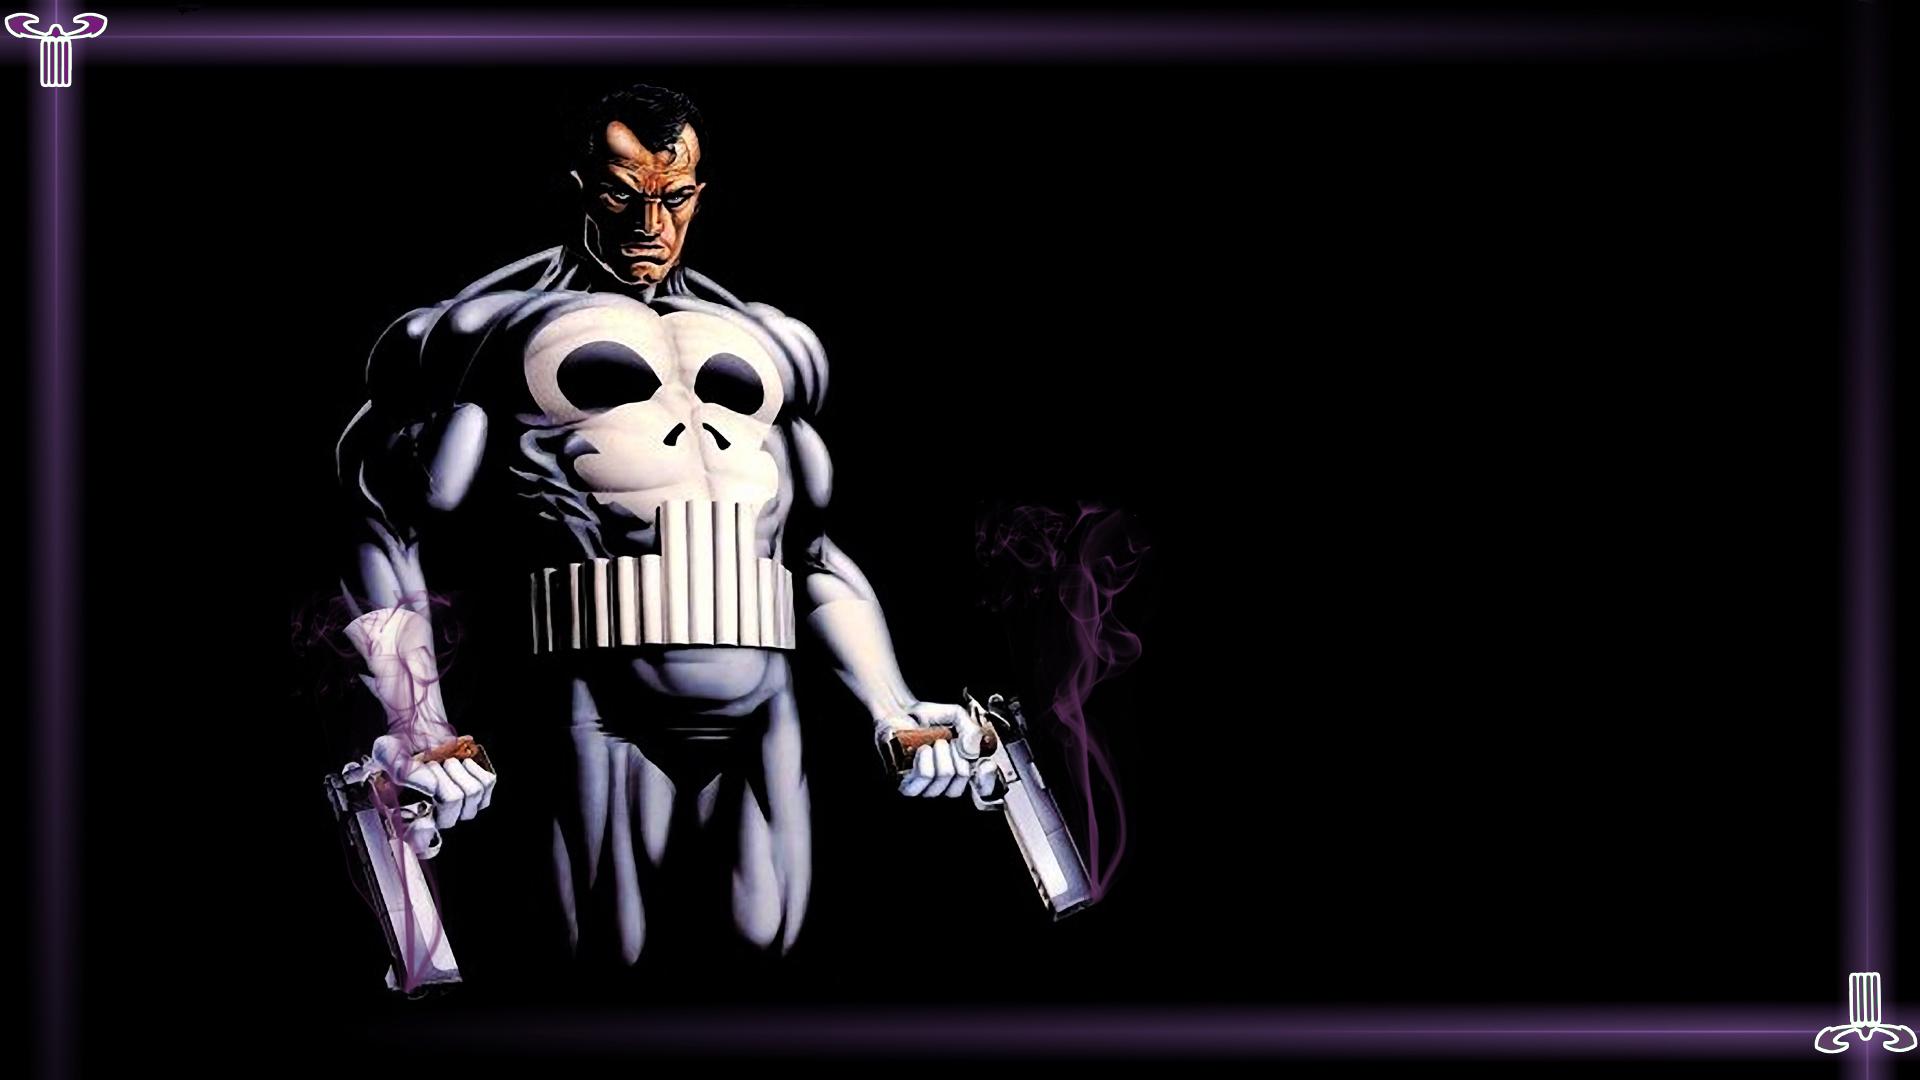 Wonderful Wallpaper Marvel Punisher - J0681b  Photograph_982031.jpg